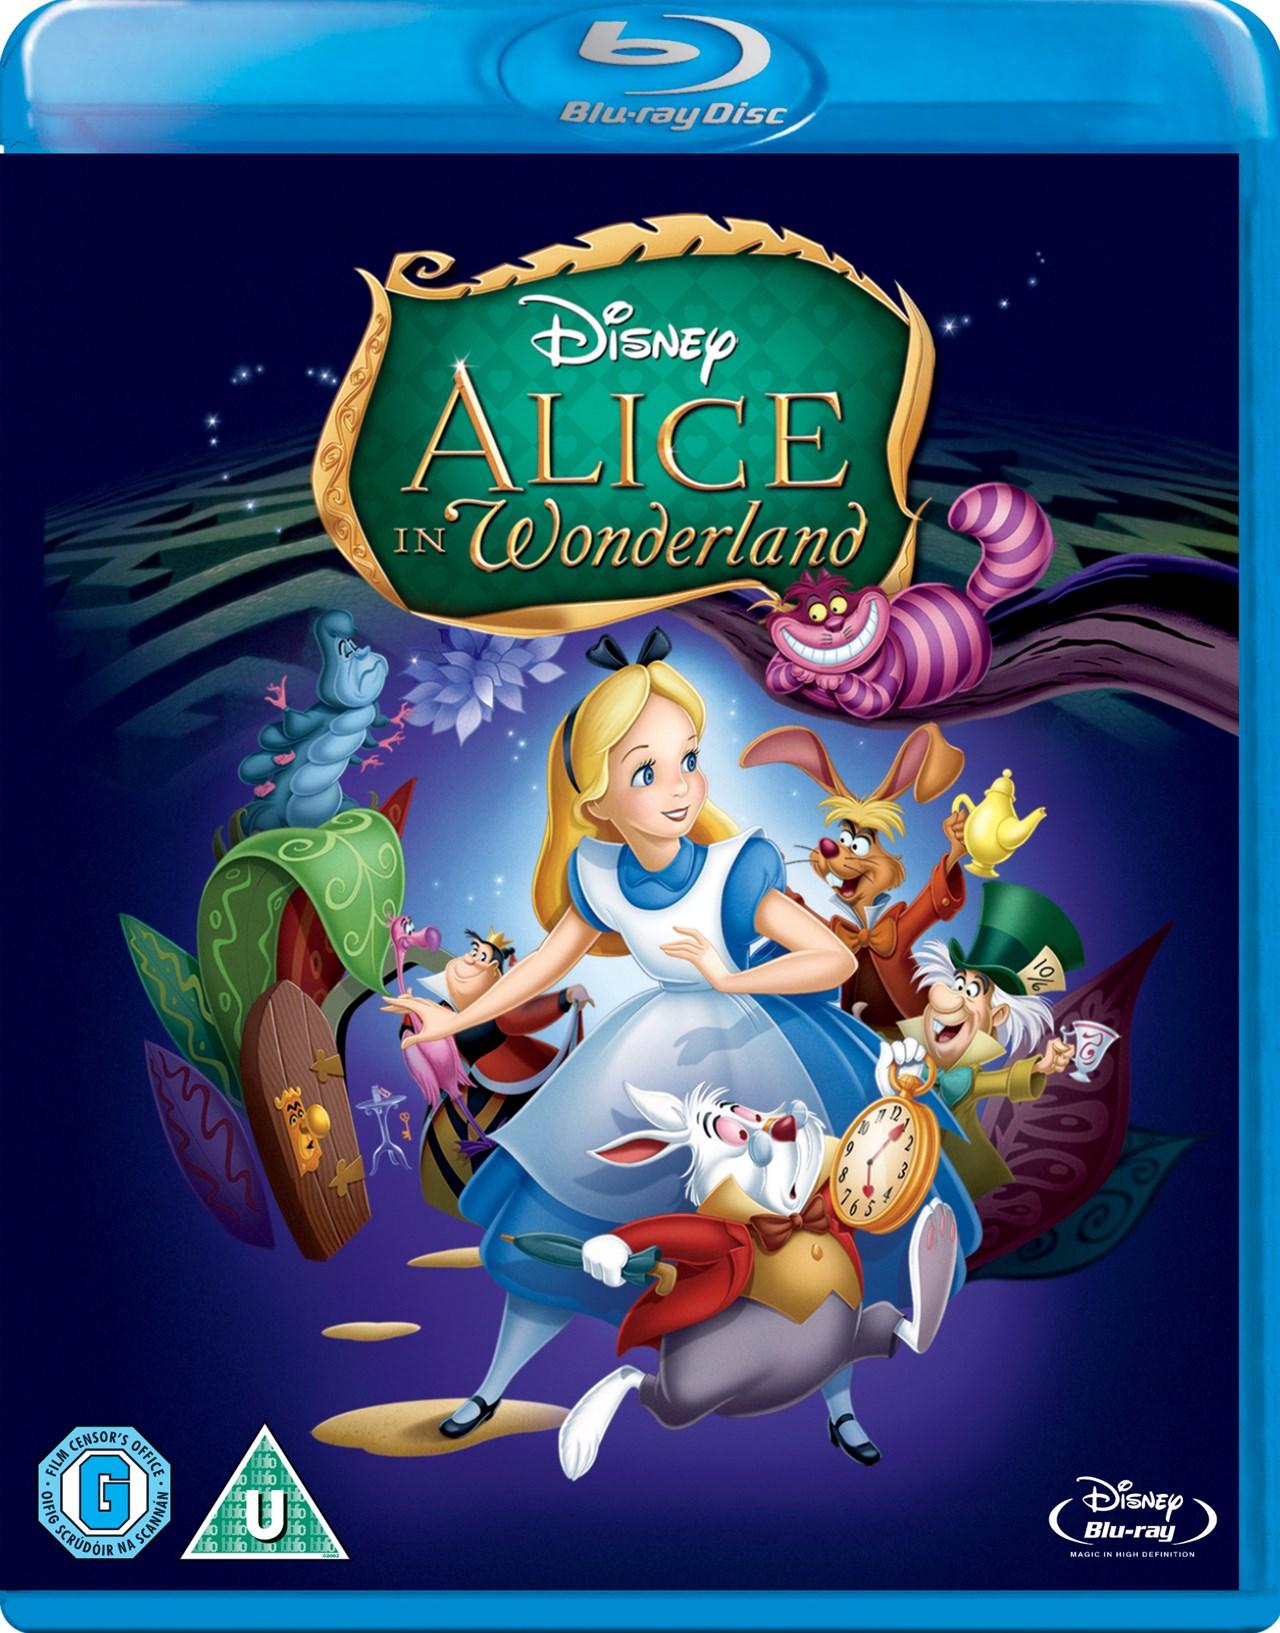 Alice in Wonderland (Disney) - 3